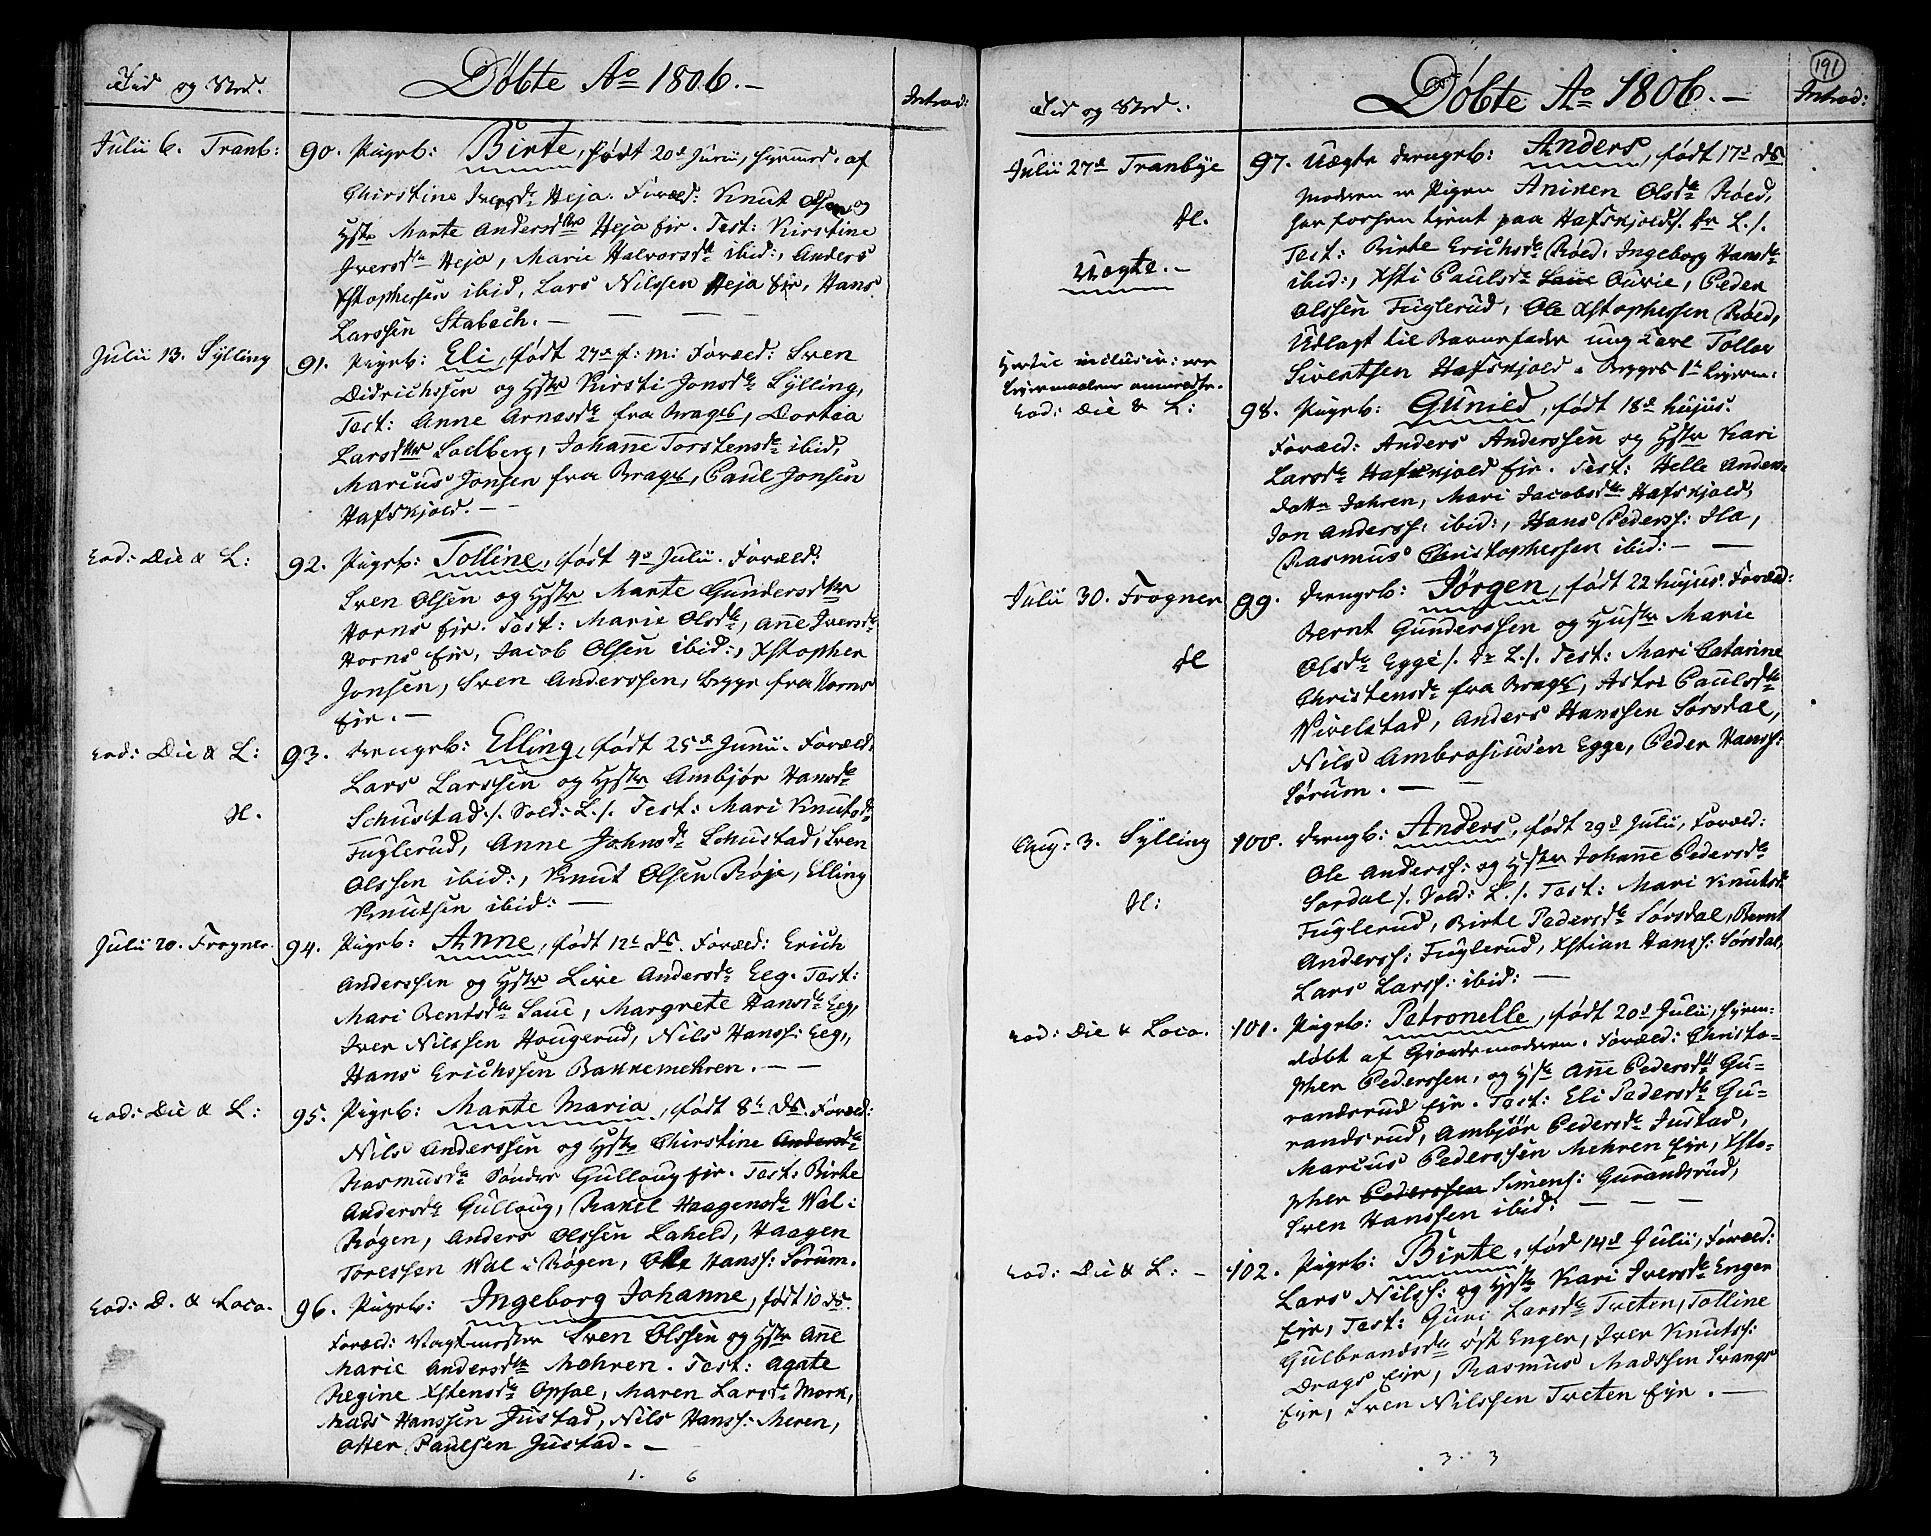 SAKO, Lier kirkebøker, F/Fa/L0007: Ministerialbok nr. I 7, 1794-1813, s. 191